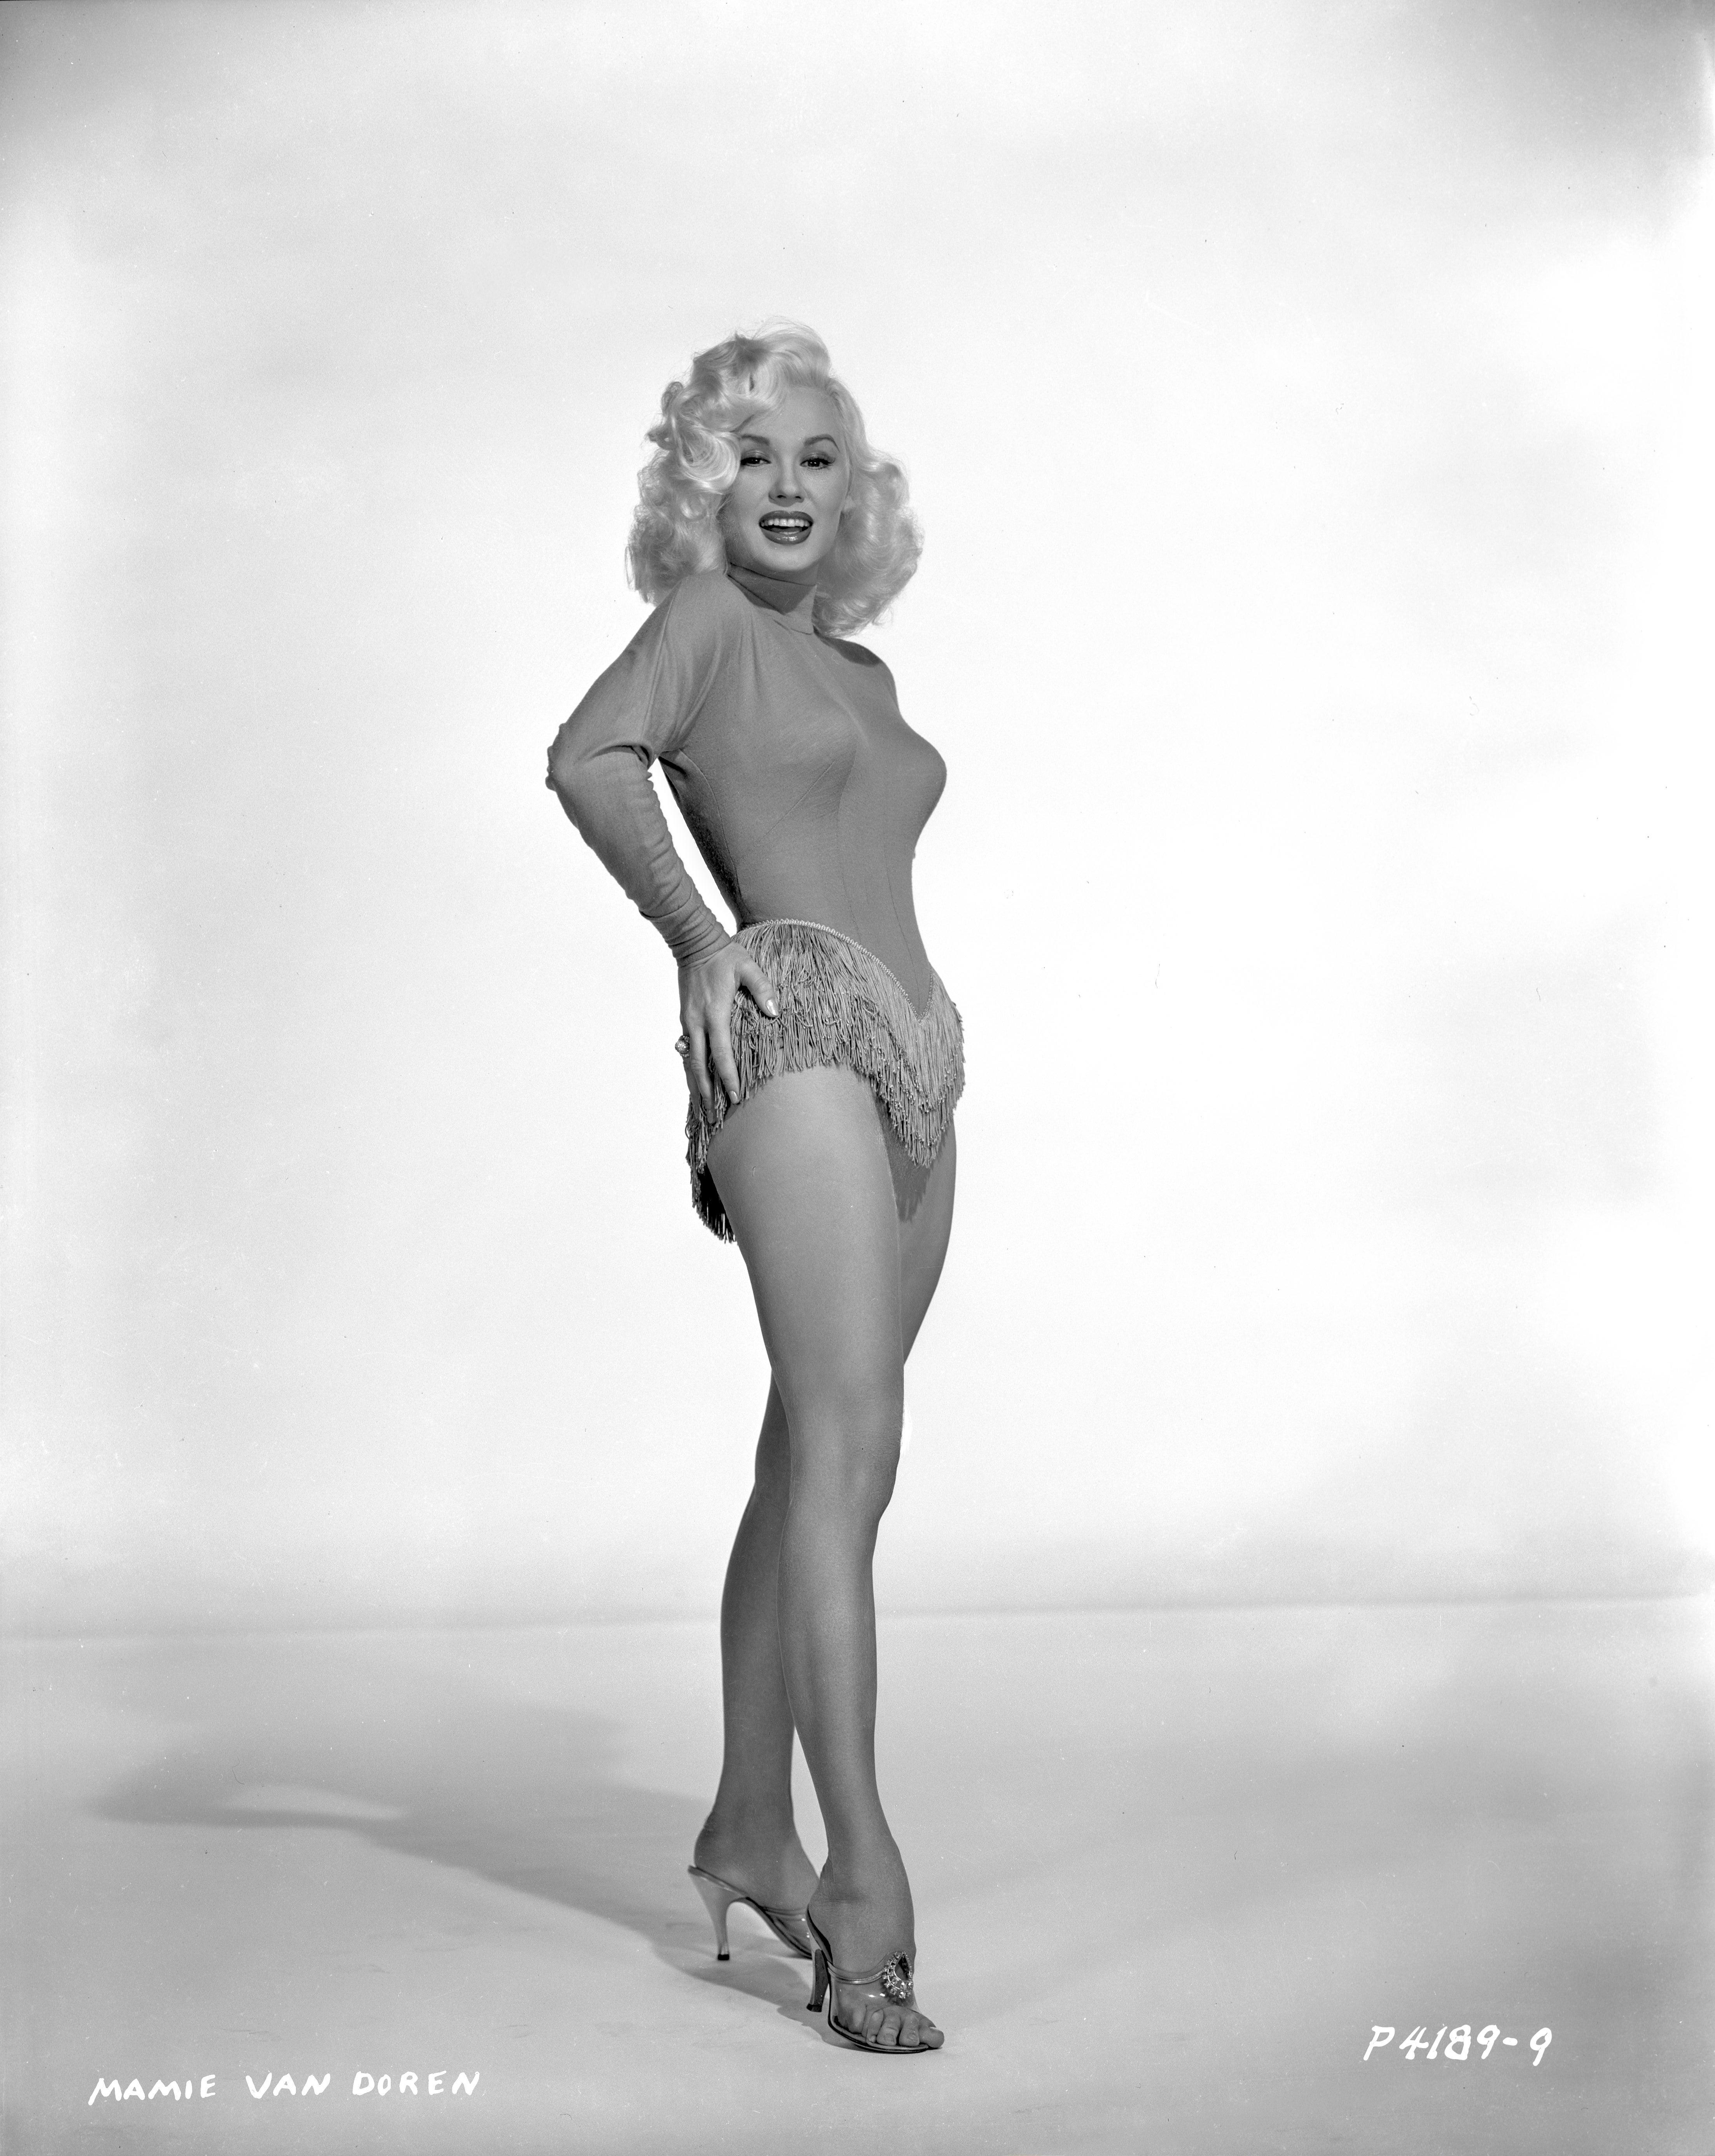 Marie Osmond,Mish Kerley Porno movies Bunga Jelitha,Mosang (b. 1972)